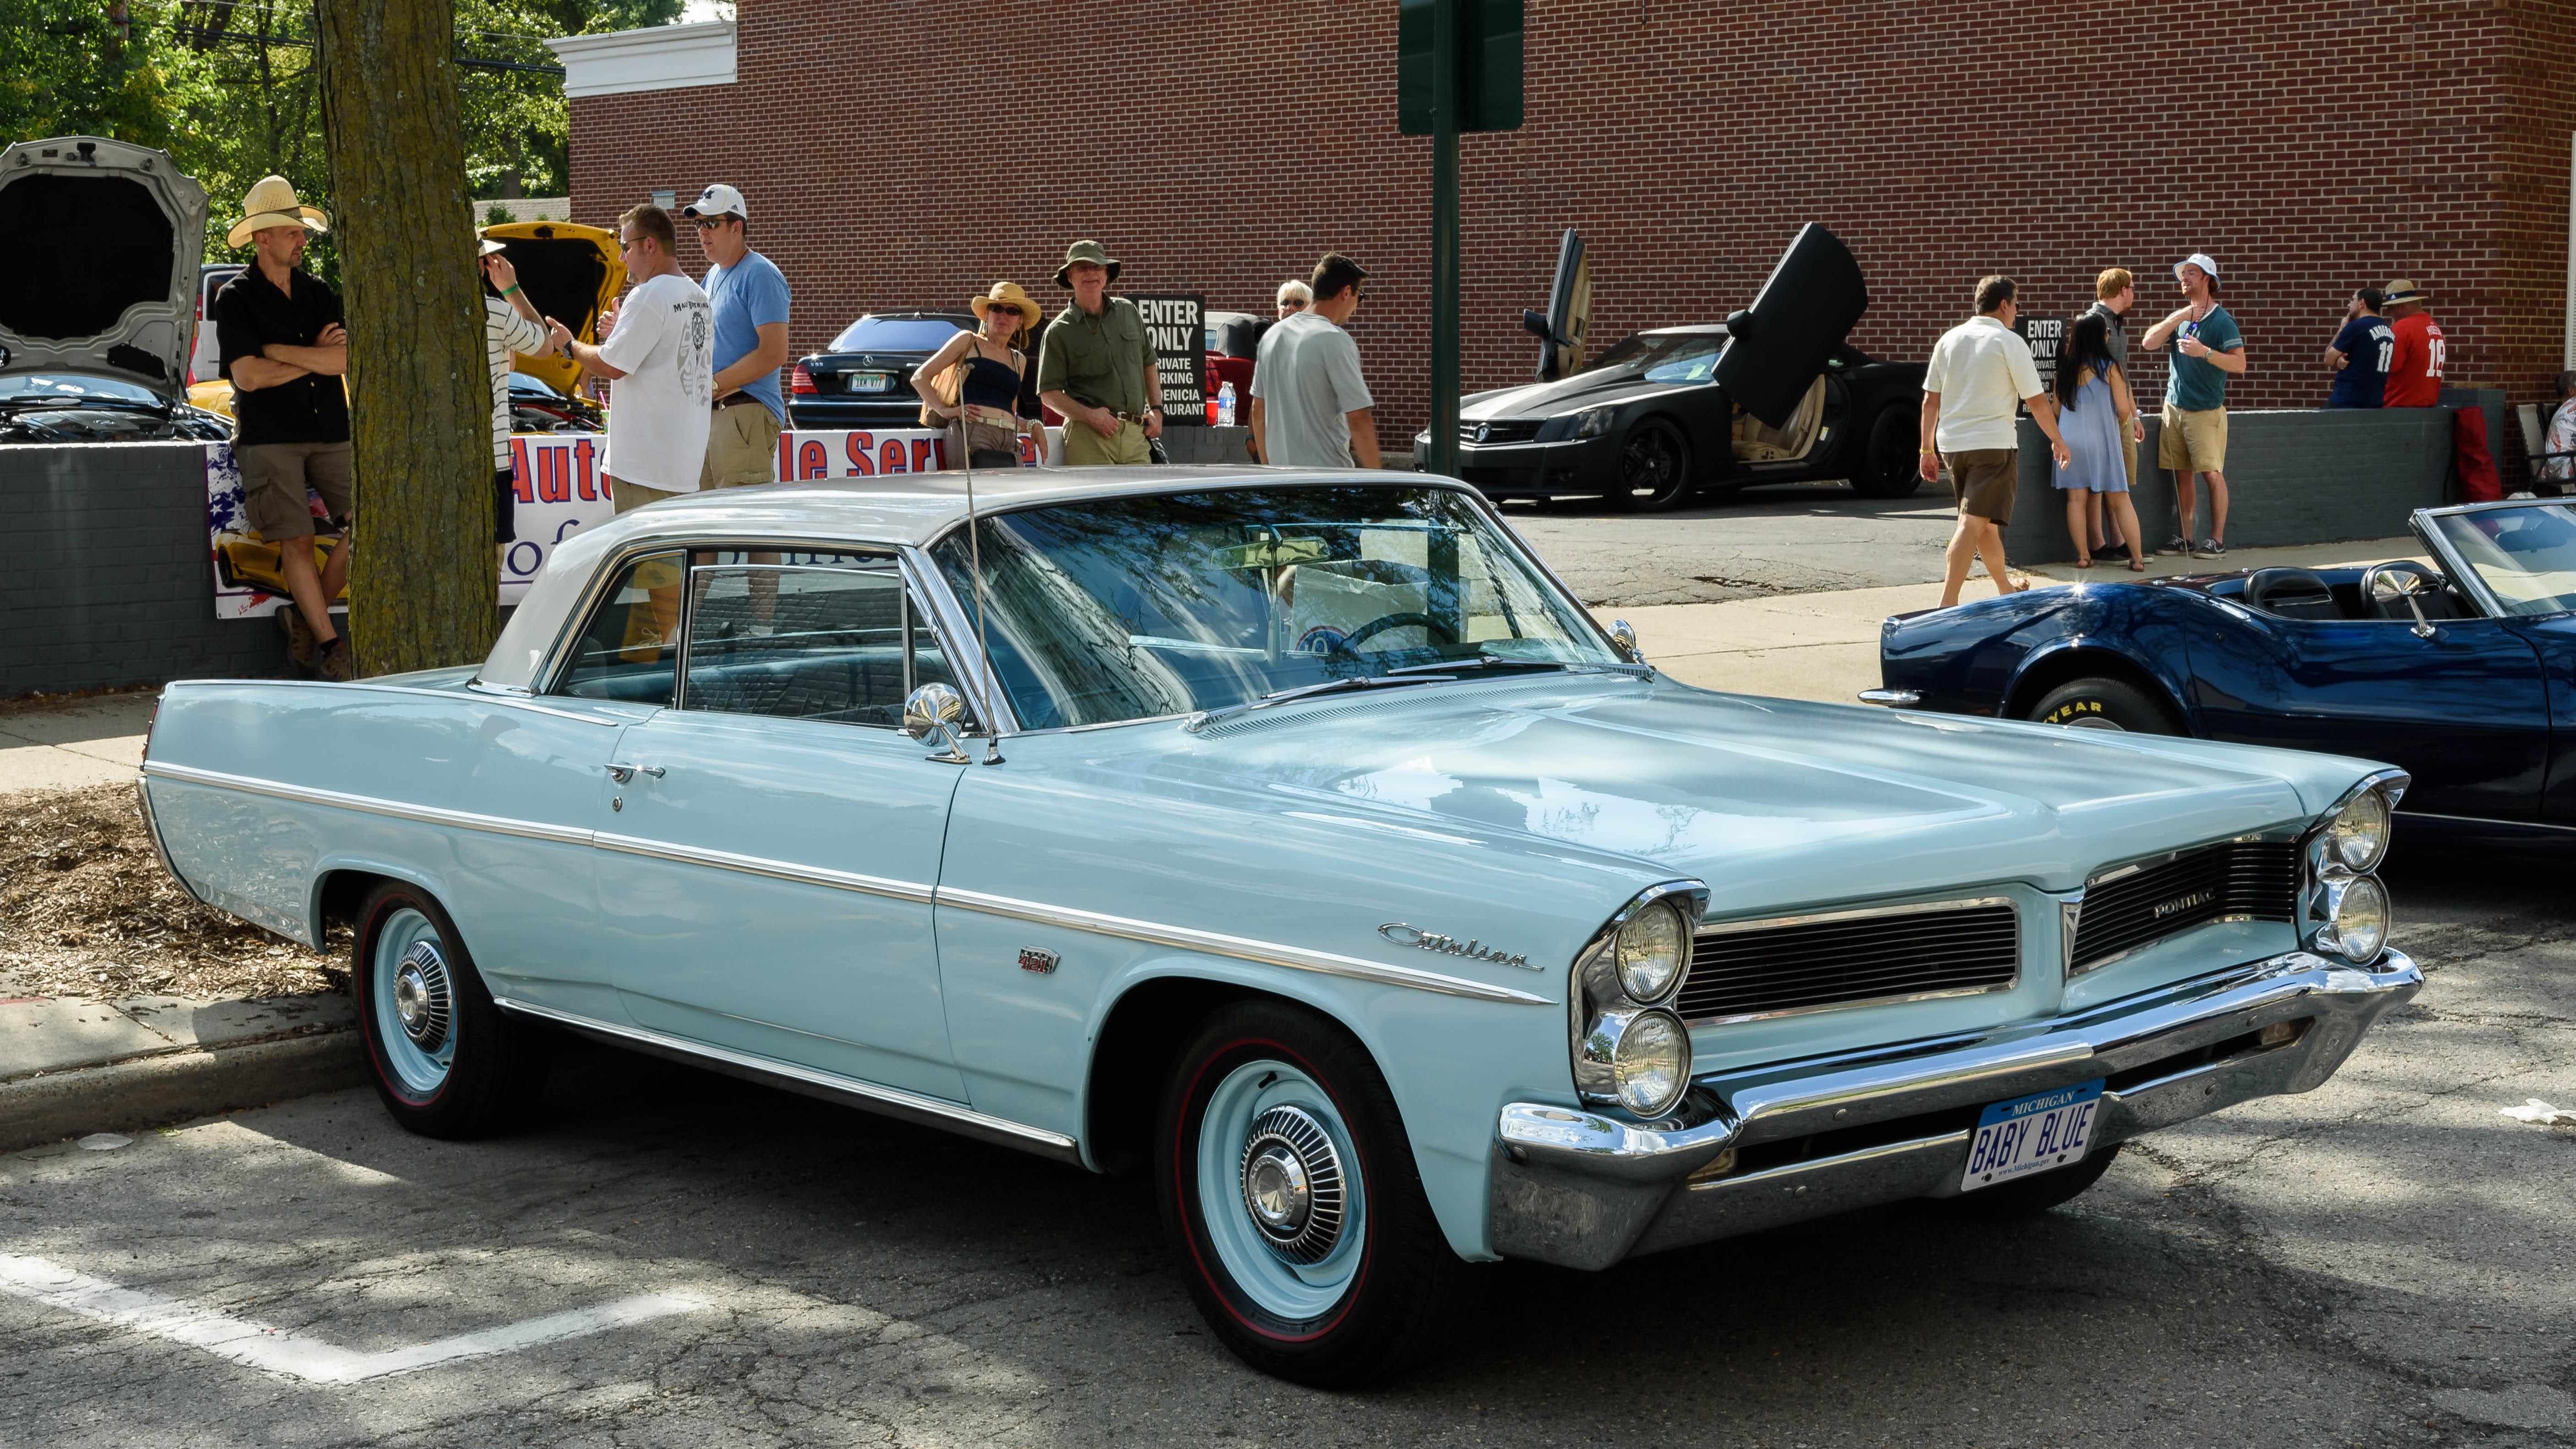 1963 Pontiac Catalina, 2015, American, Birmingham, Car, HQ Photo